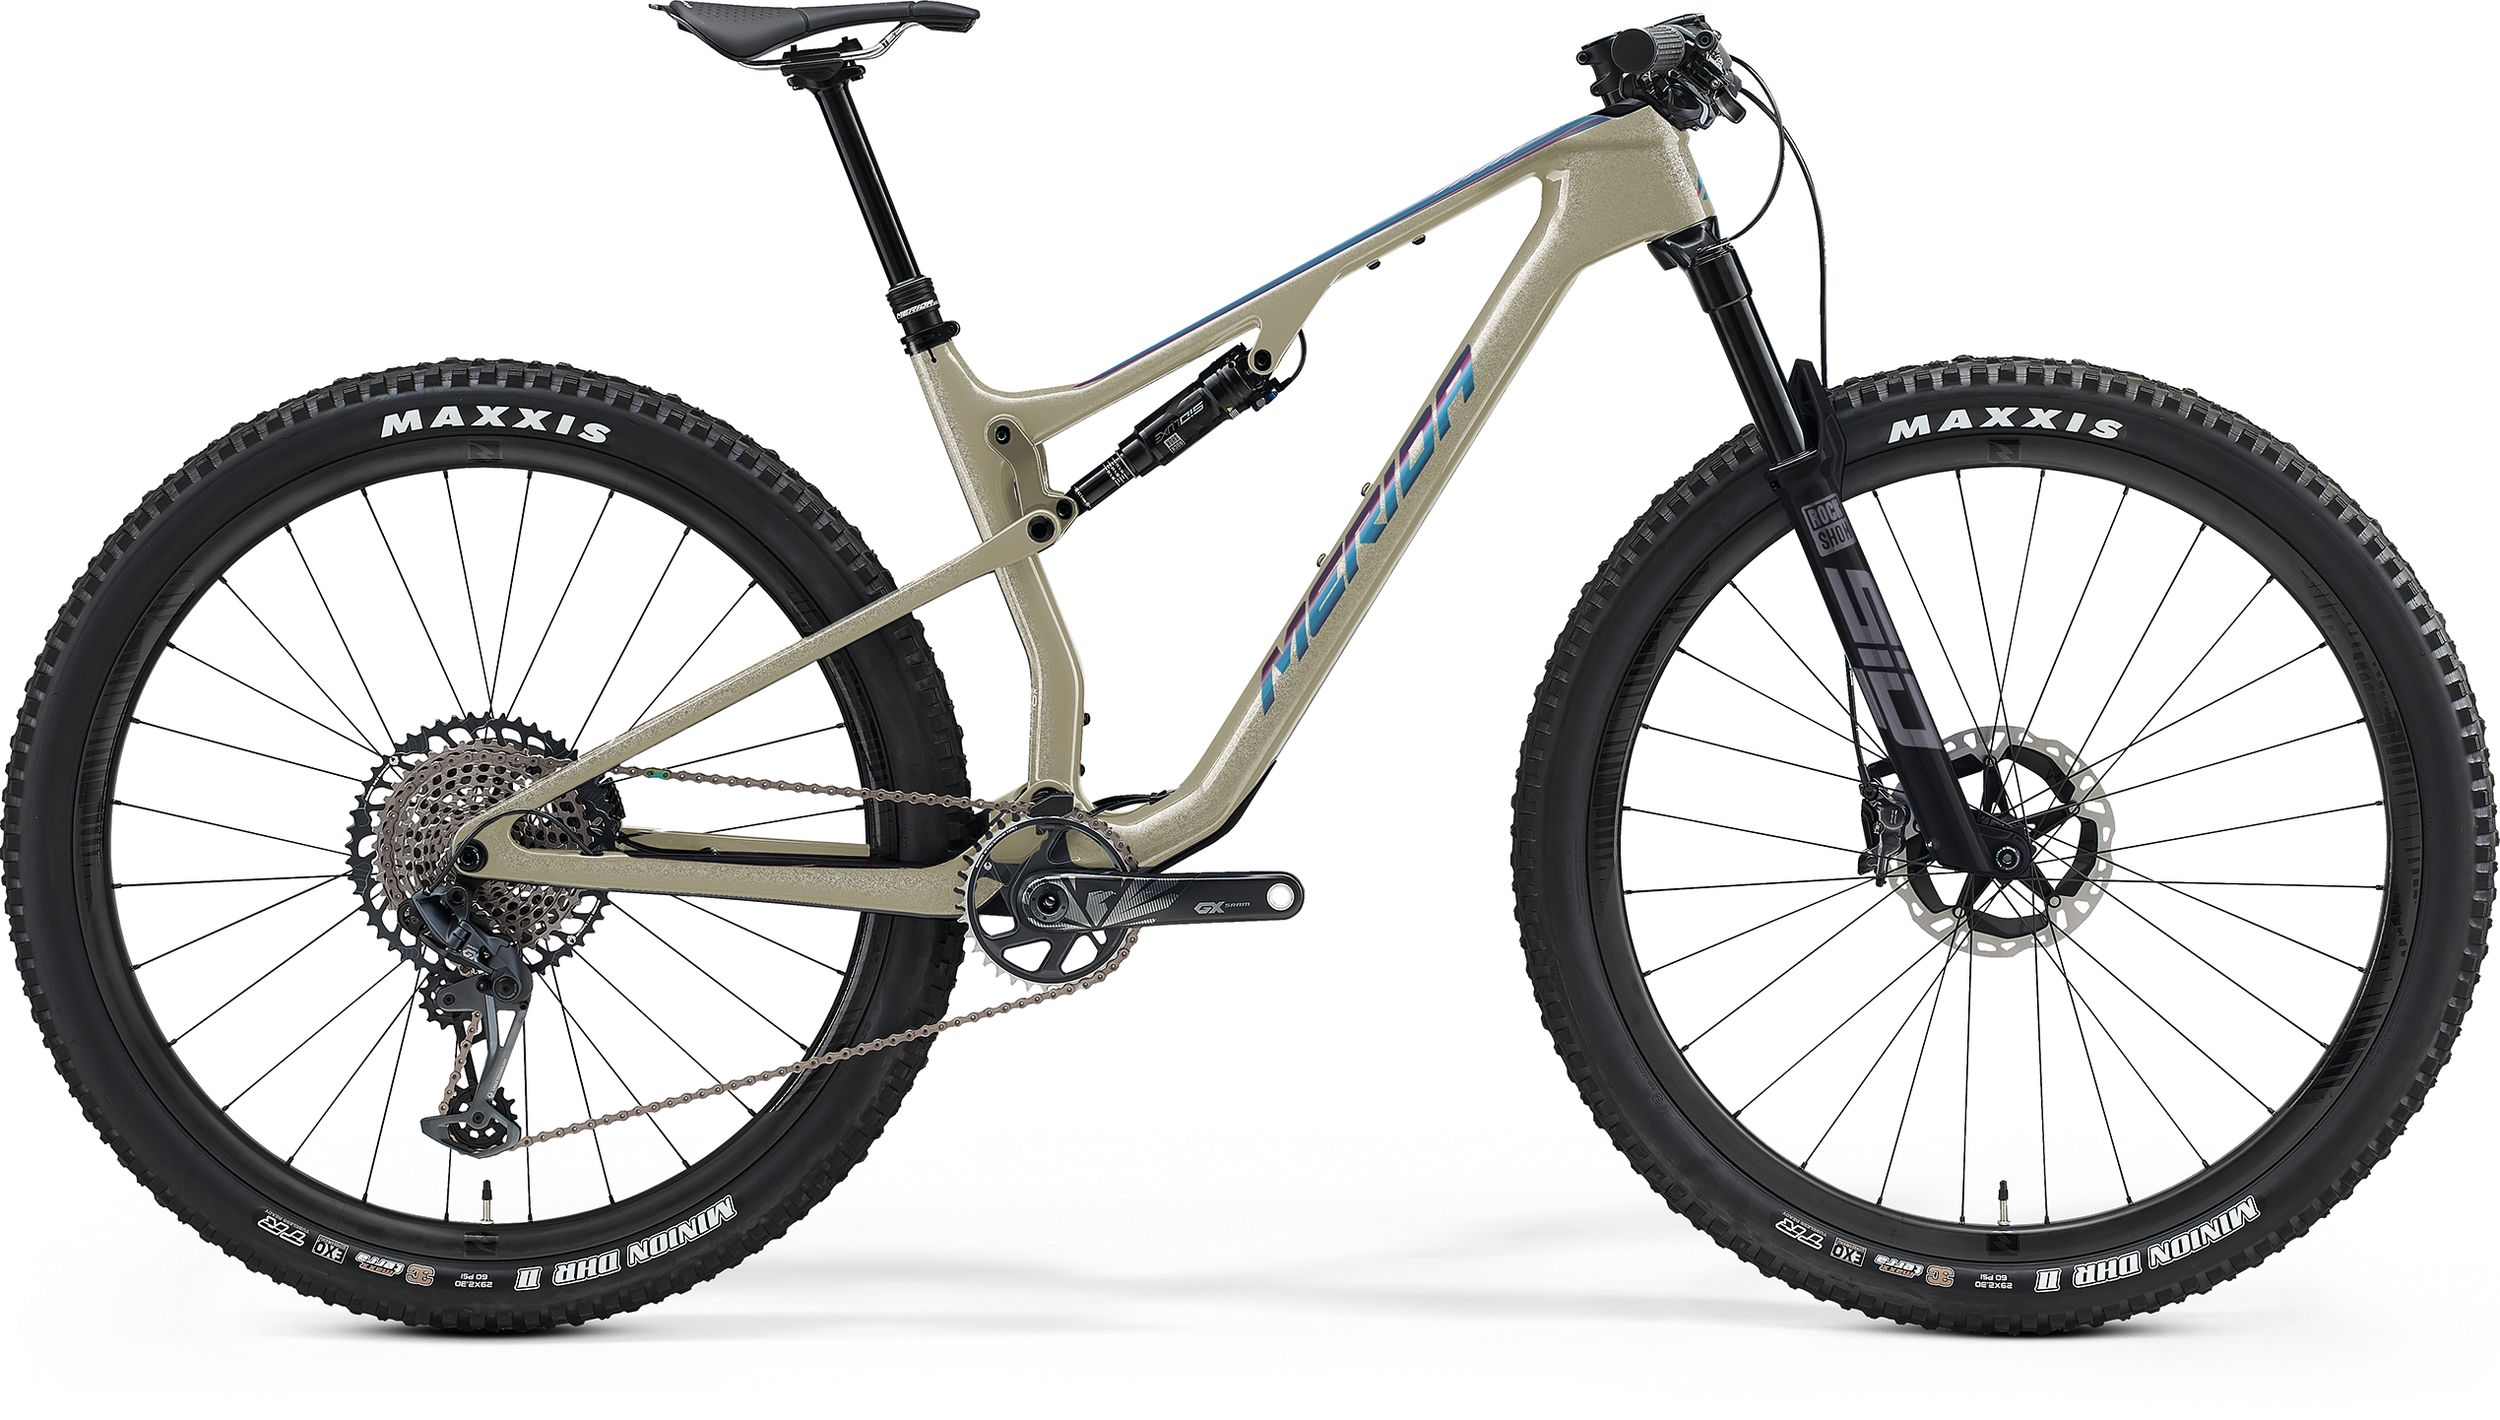 NINETY-SIX 6000